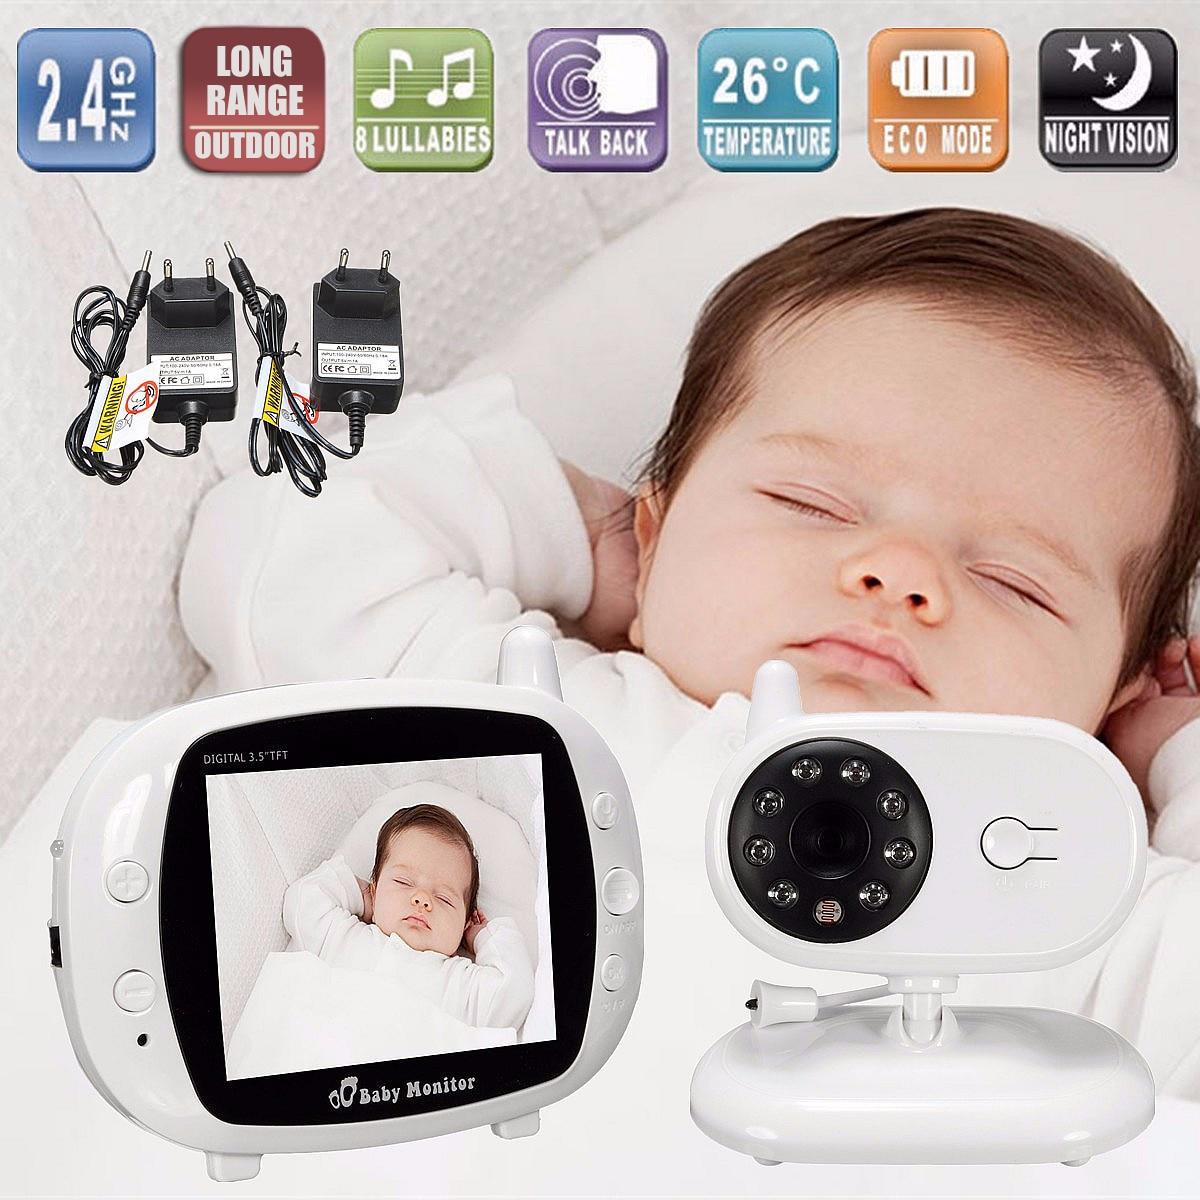 2 4G Wireless Digital 3 5 LCD Baby Monitor Wifi Camera Audio Talk Video Night Vision